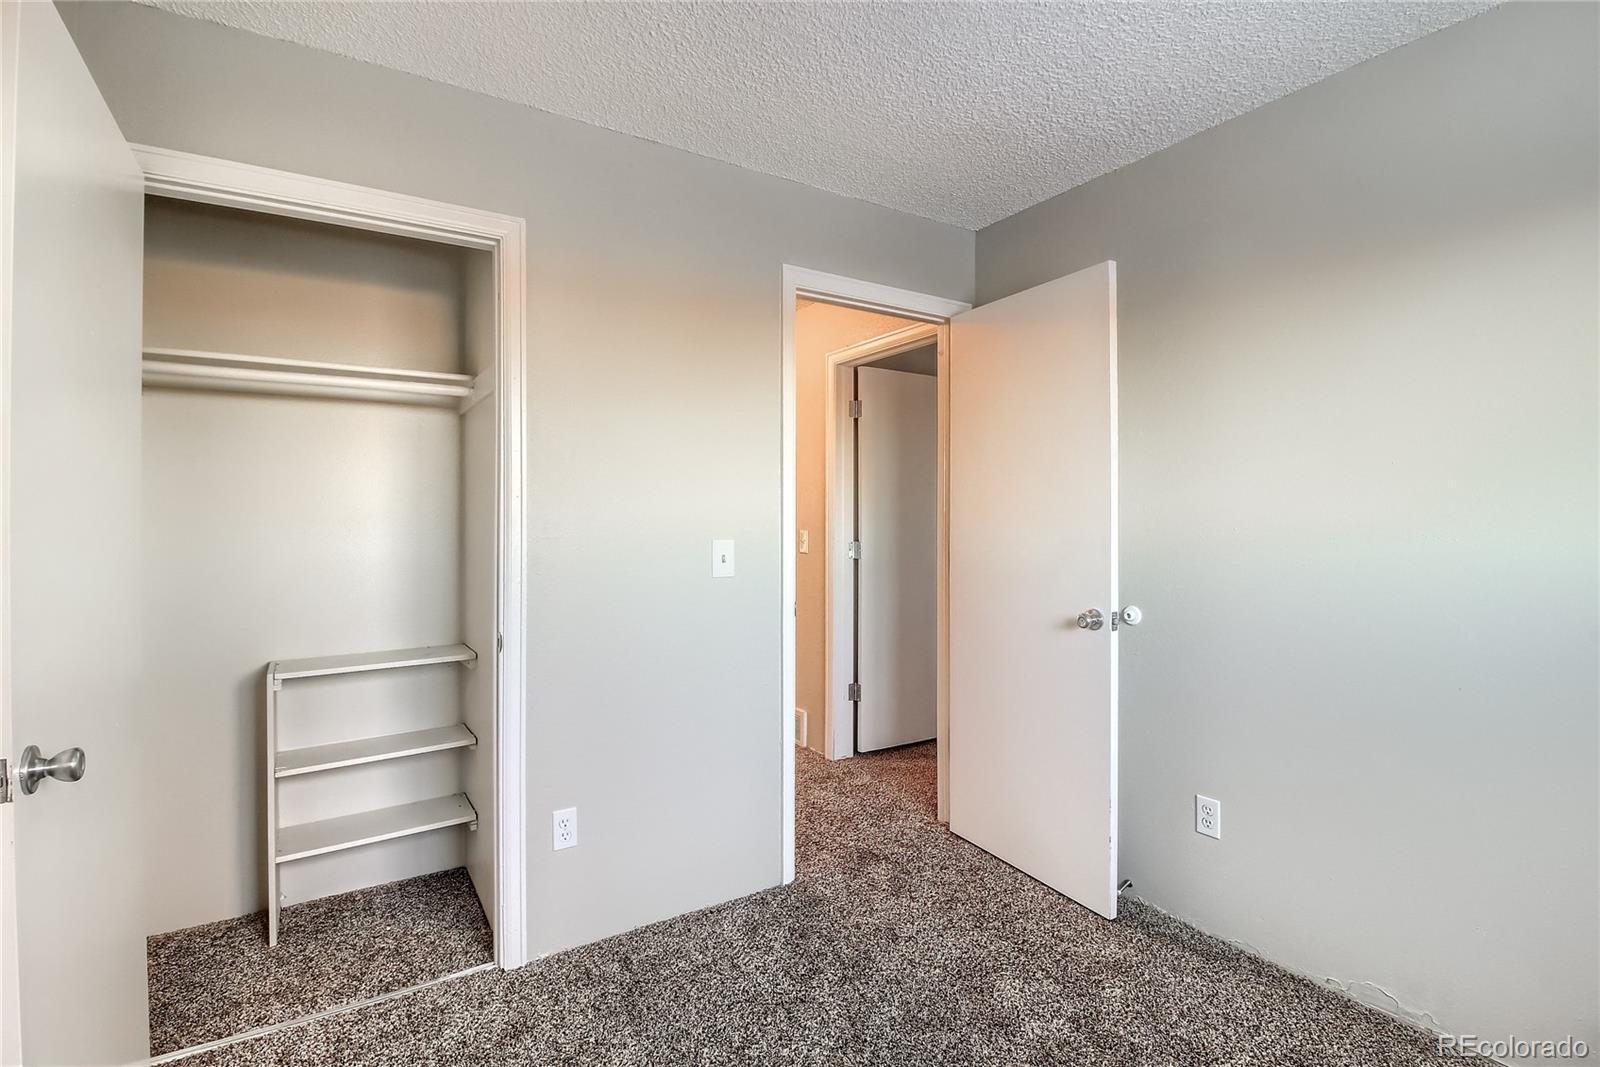 MLS# 8804701 - 21 - 20615 E Coolidge Place, Aurora, CO 80011